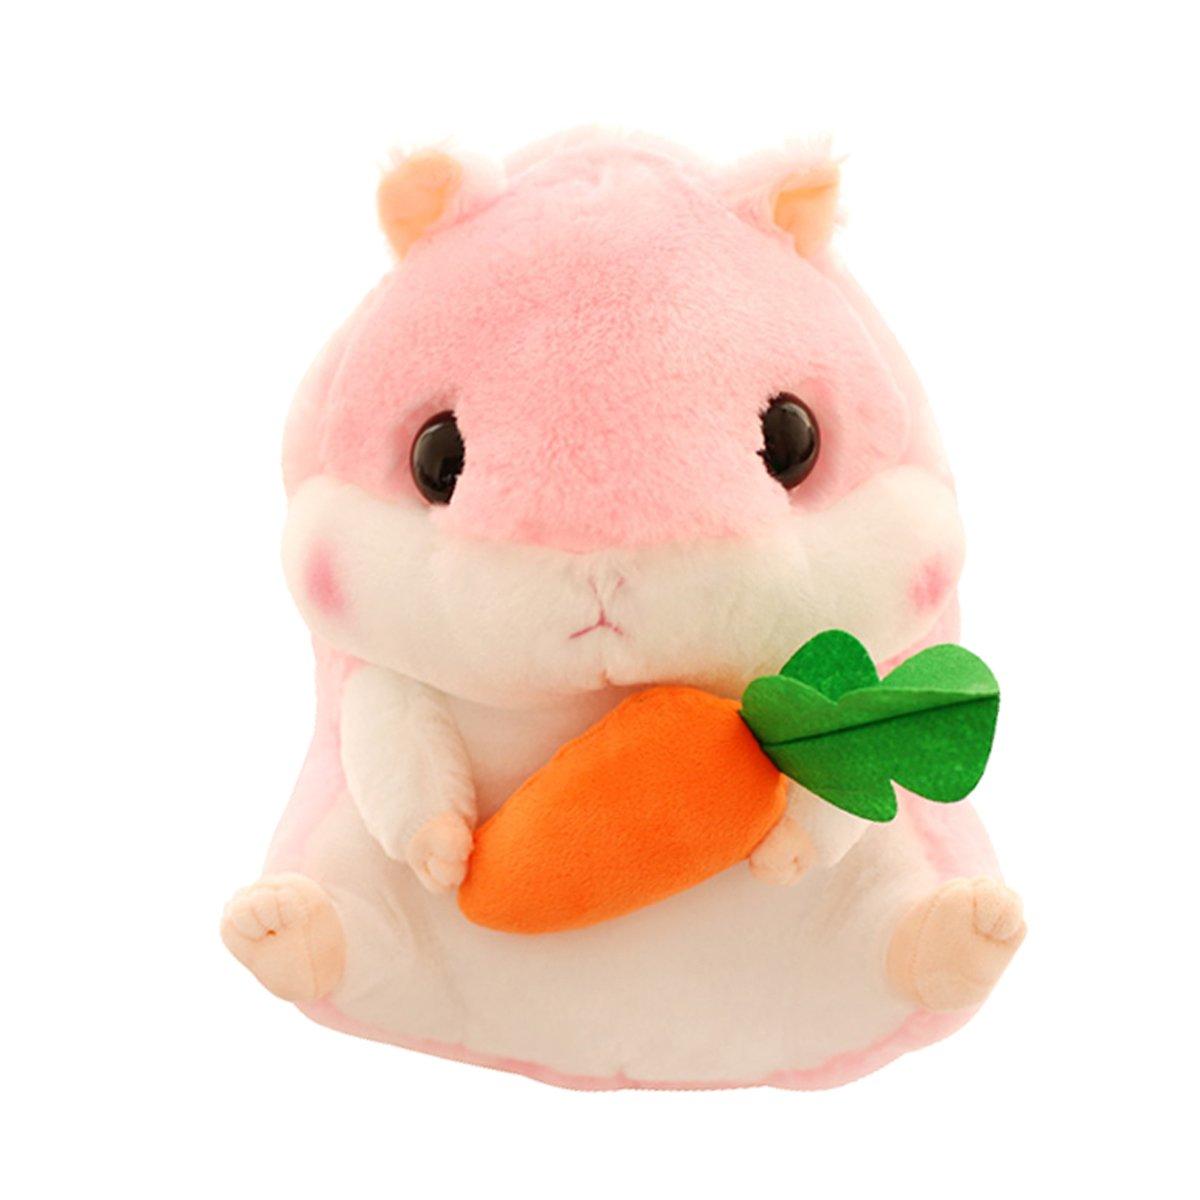 CuddlyハムスターStuffed Animal人形25